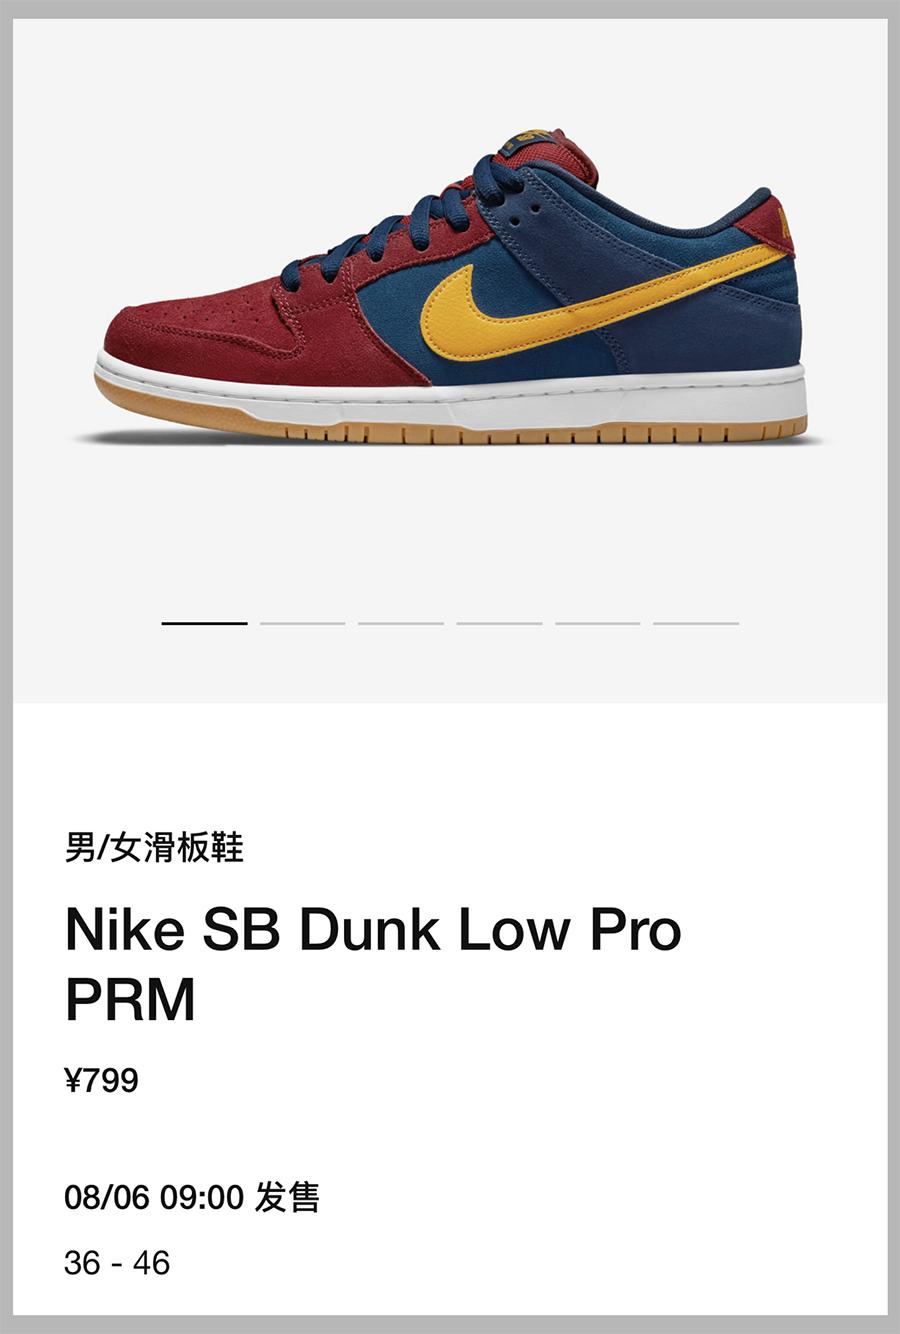 Nike,SB Dunk Low Pro,Barcelona  鸳鸯鞋身、三色鞋带!顶级豪门 Dunk SB 即将发售!市价不便宜!